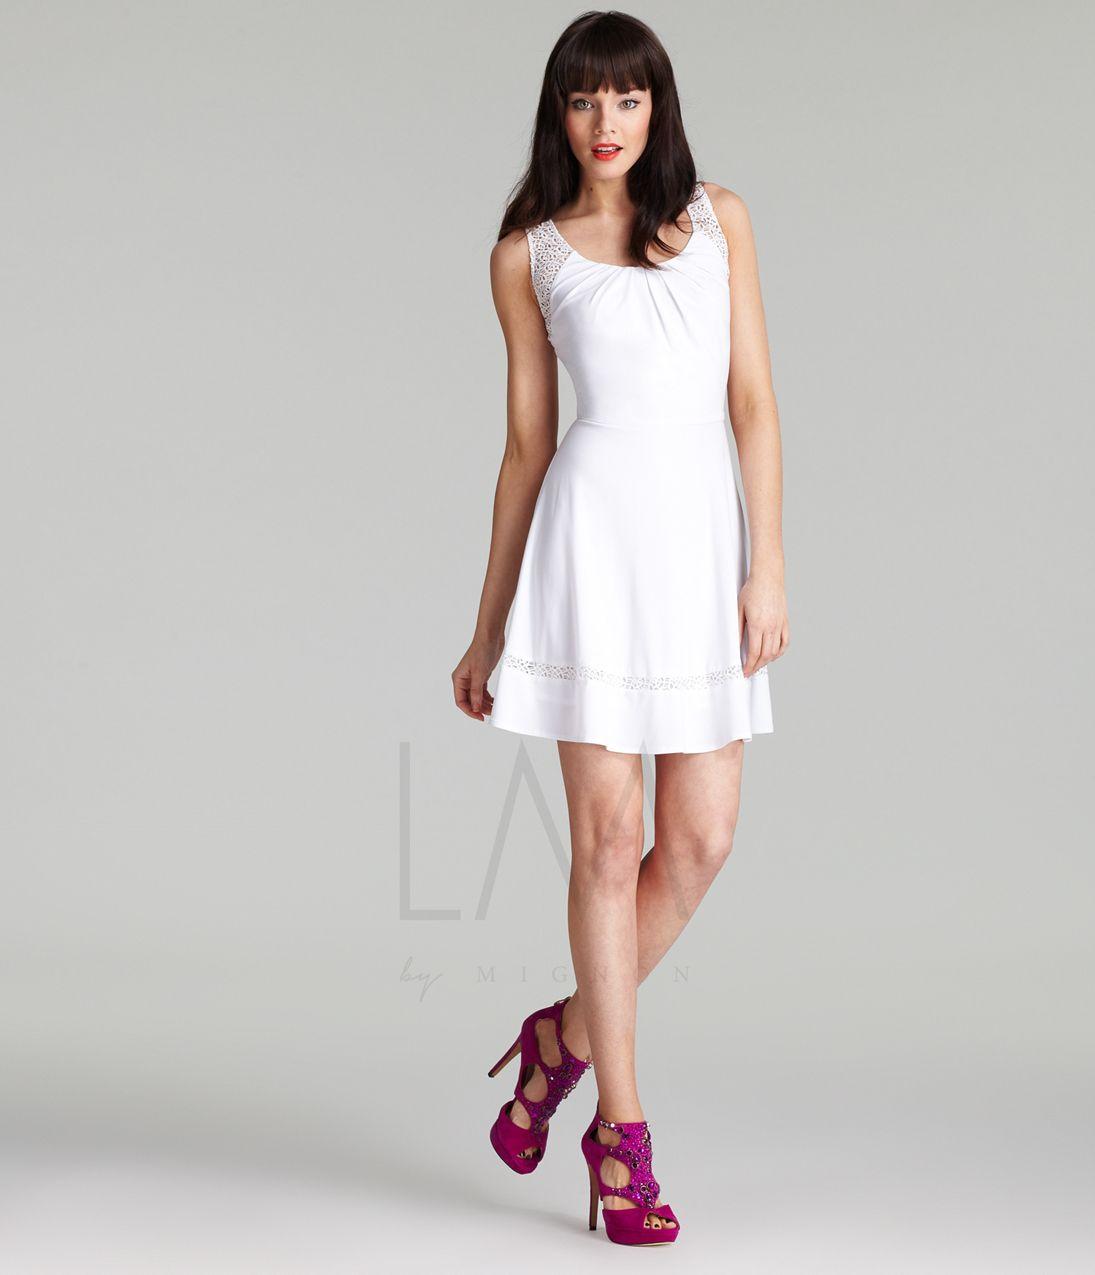 Short Summer Dresses 2013